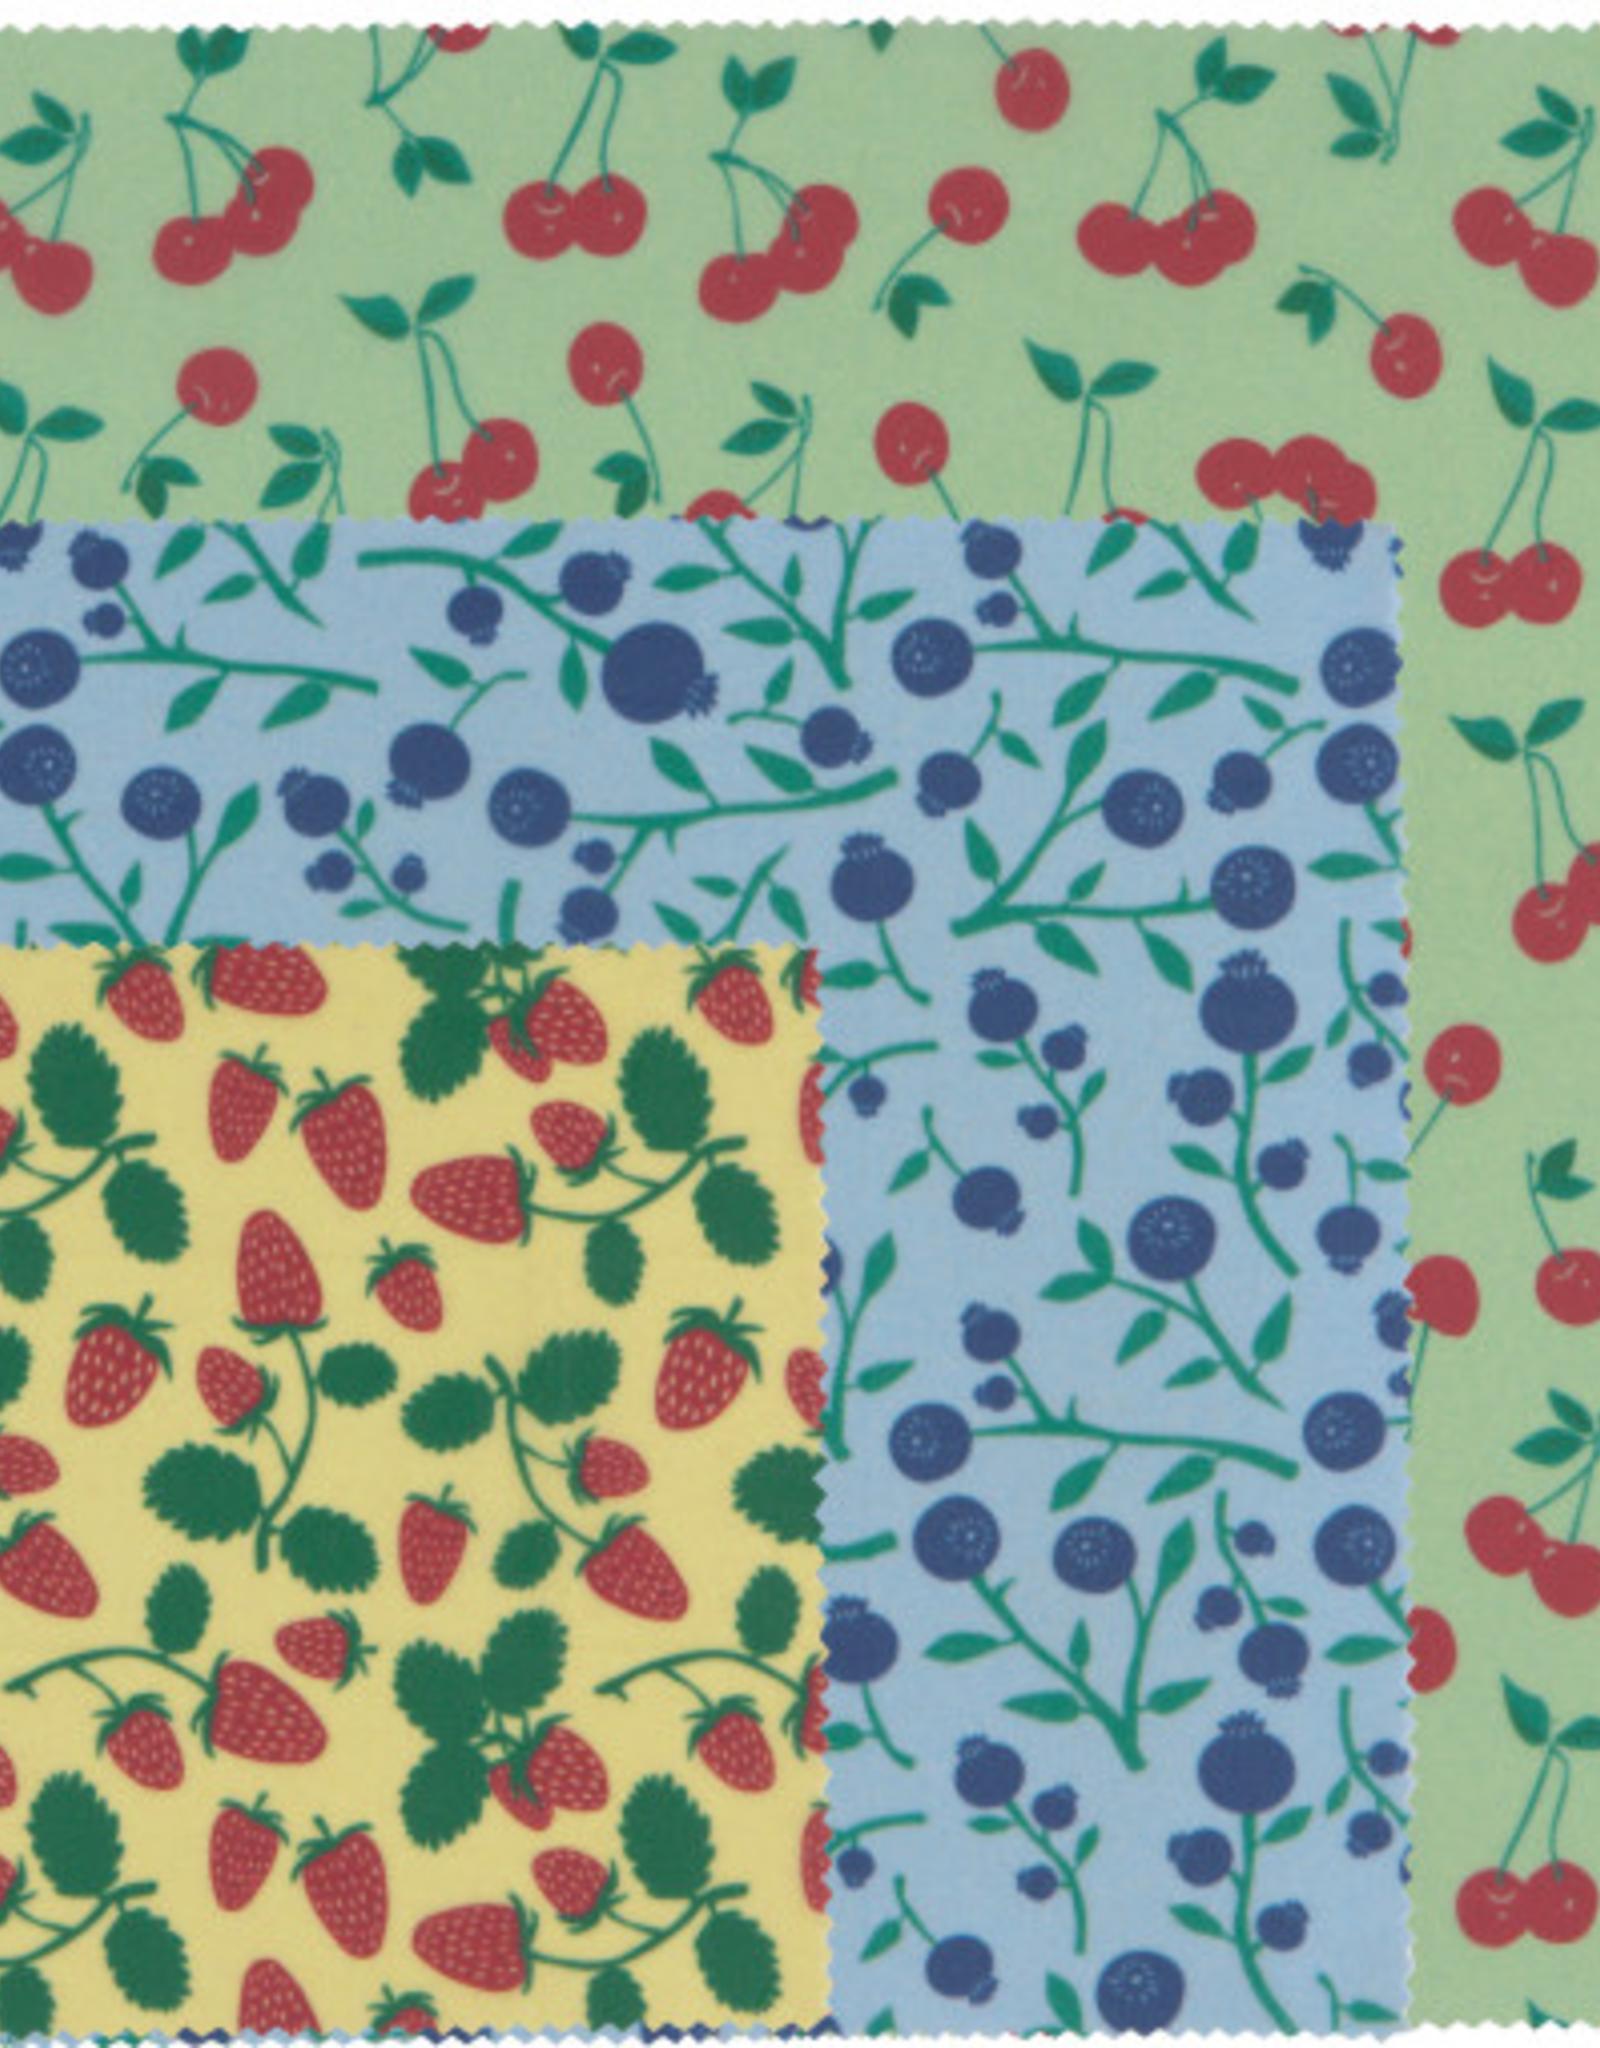 Danica Danica Beeswax Wrap-Berries And Fruit Set 3